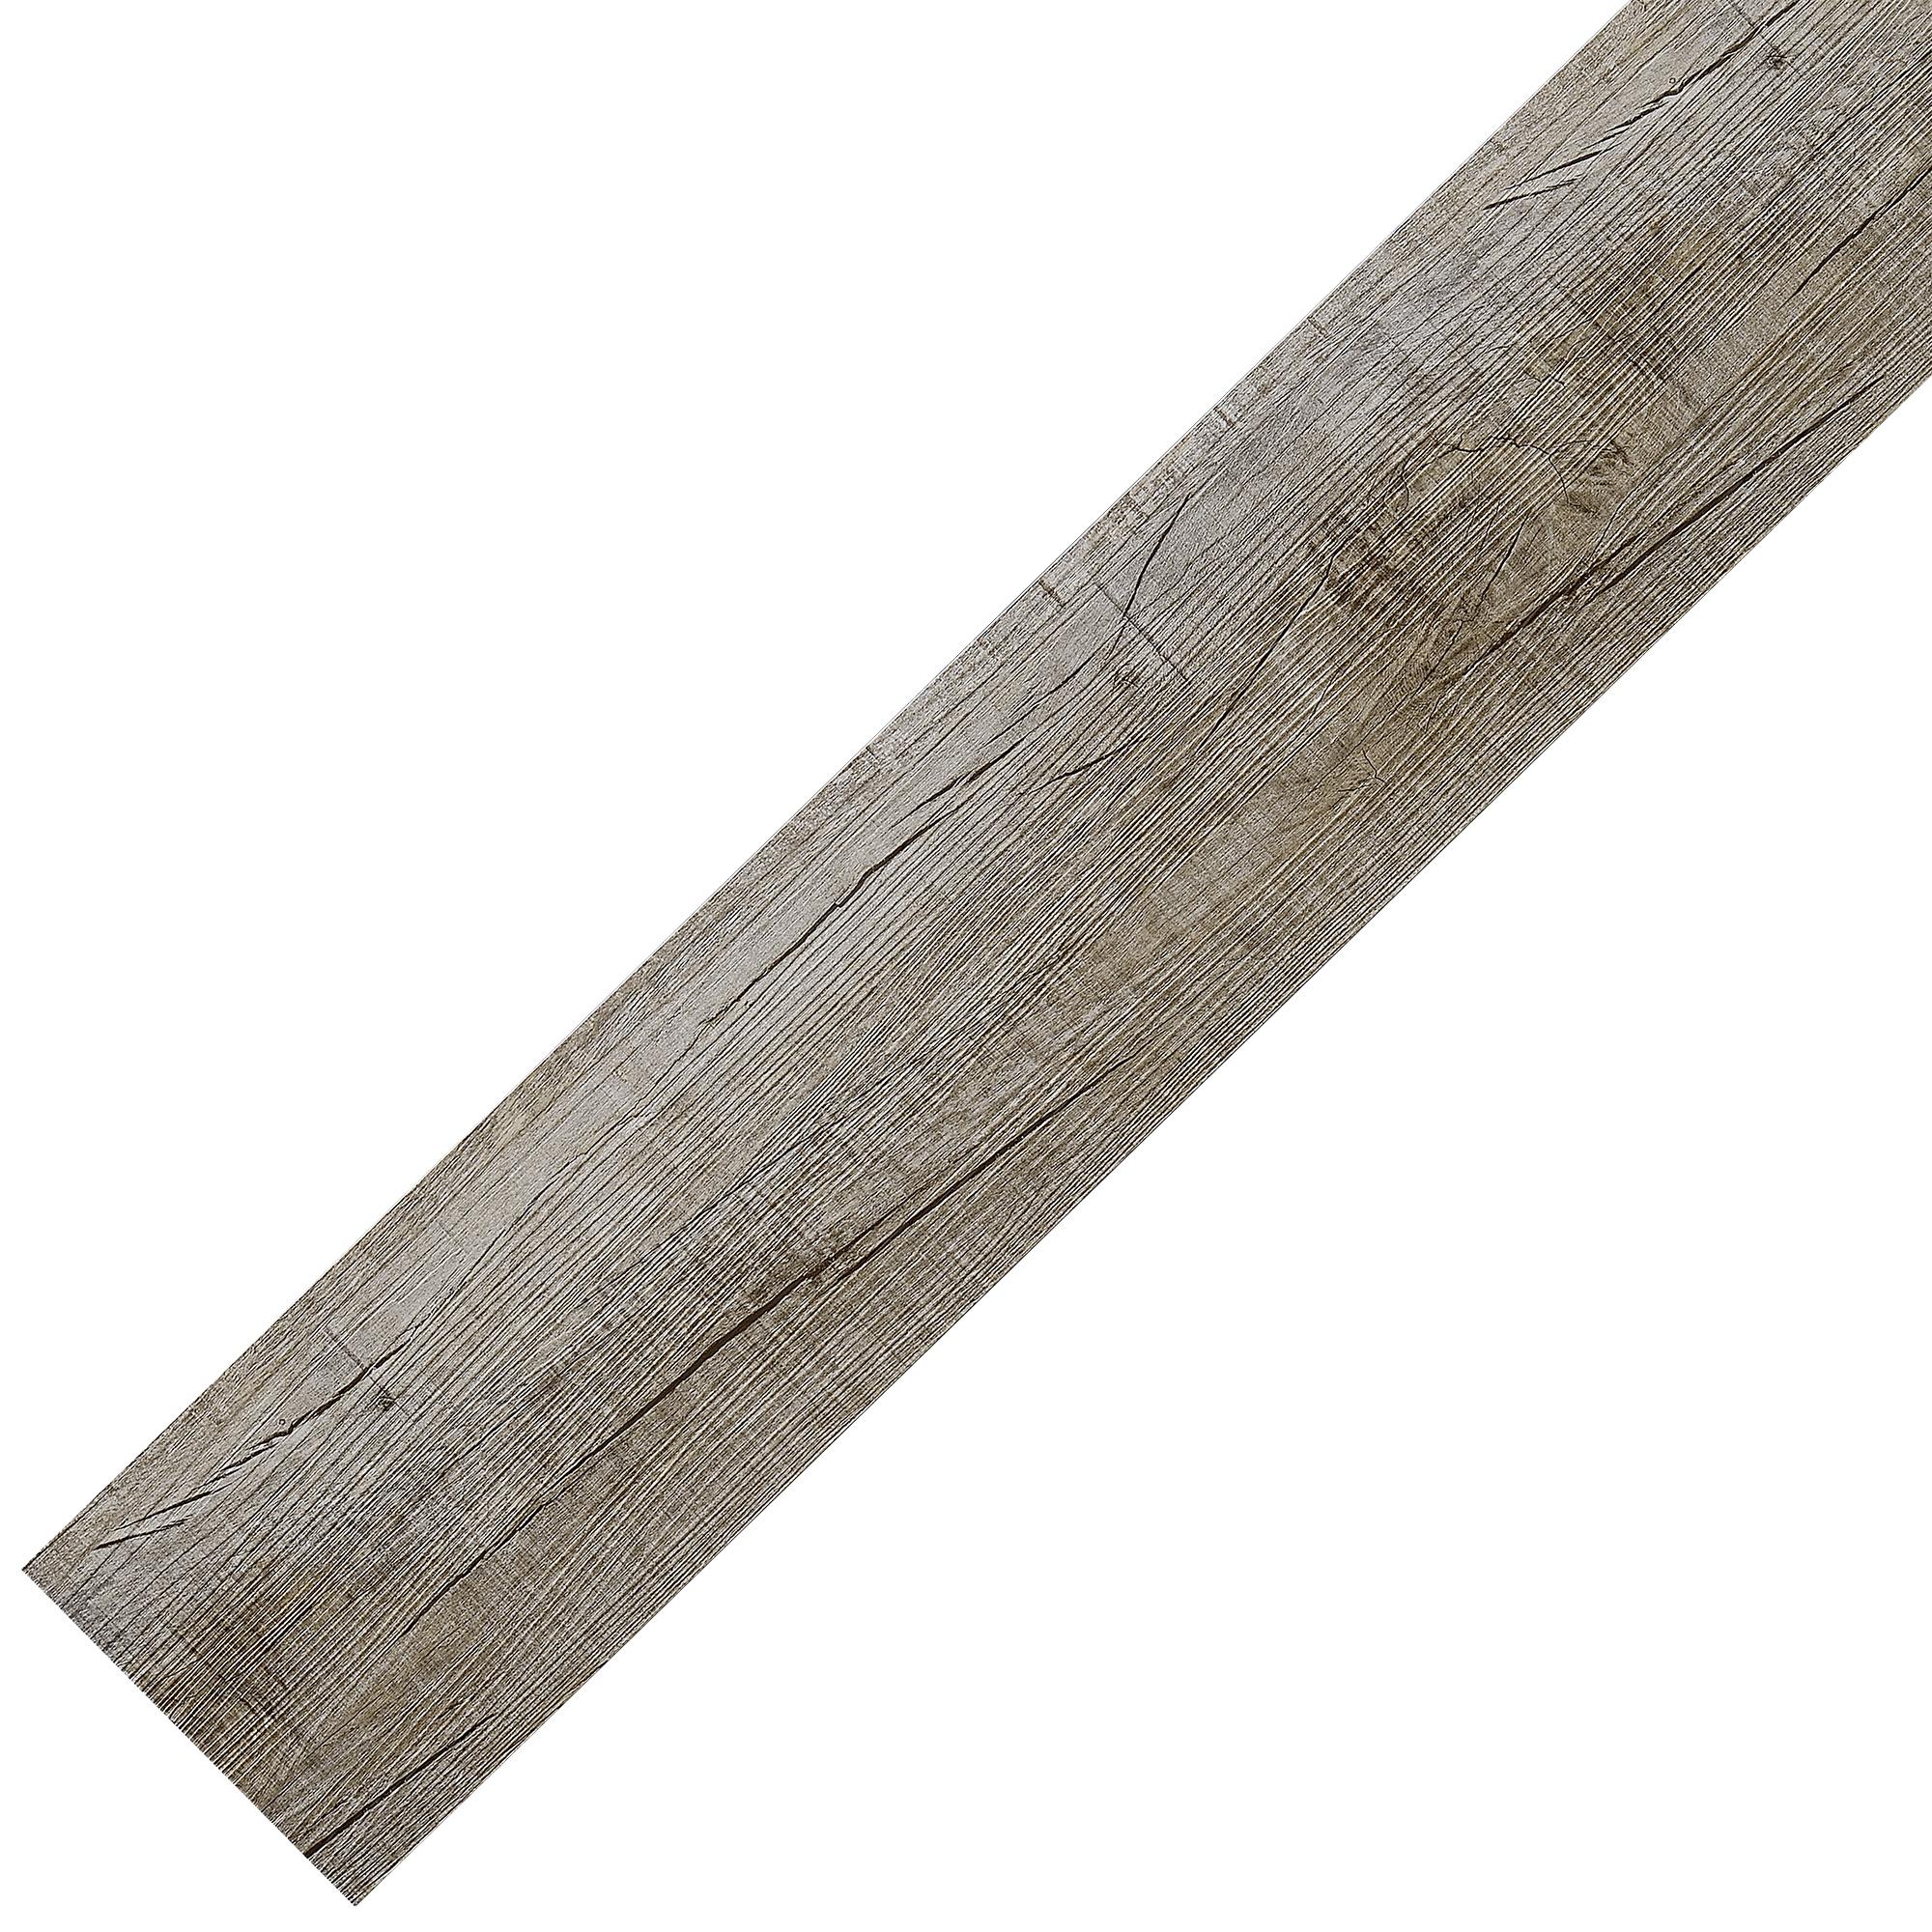 New Wood 174 6 68m 178 Vinyl Laminate Flooring Planks Oak